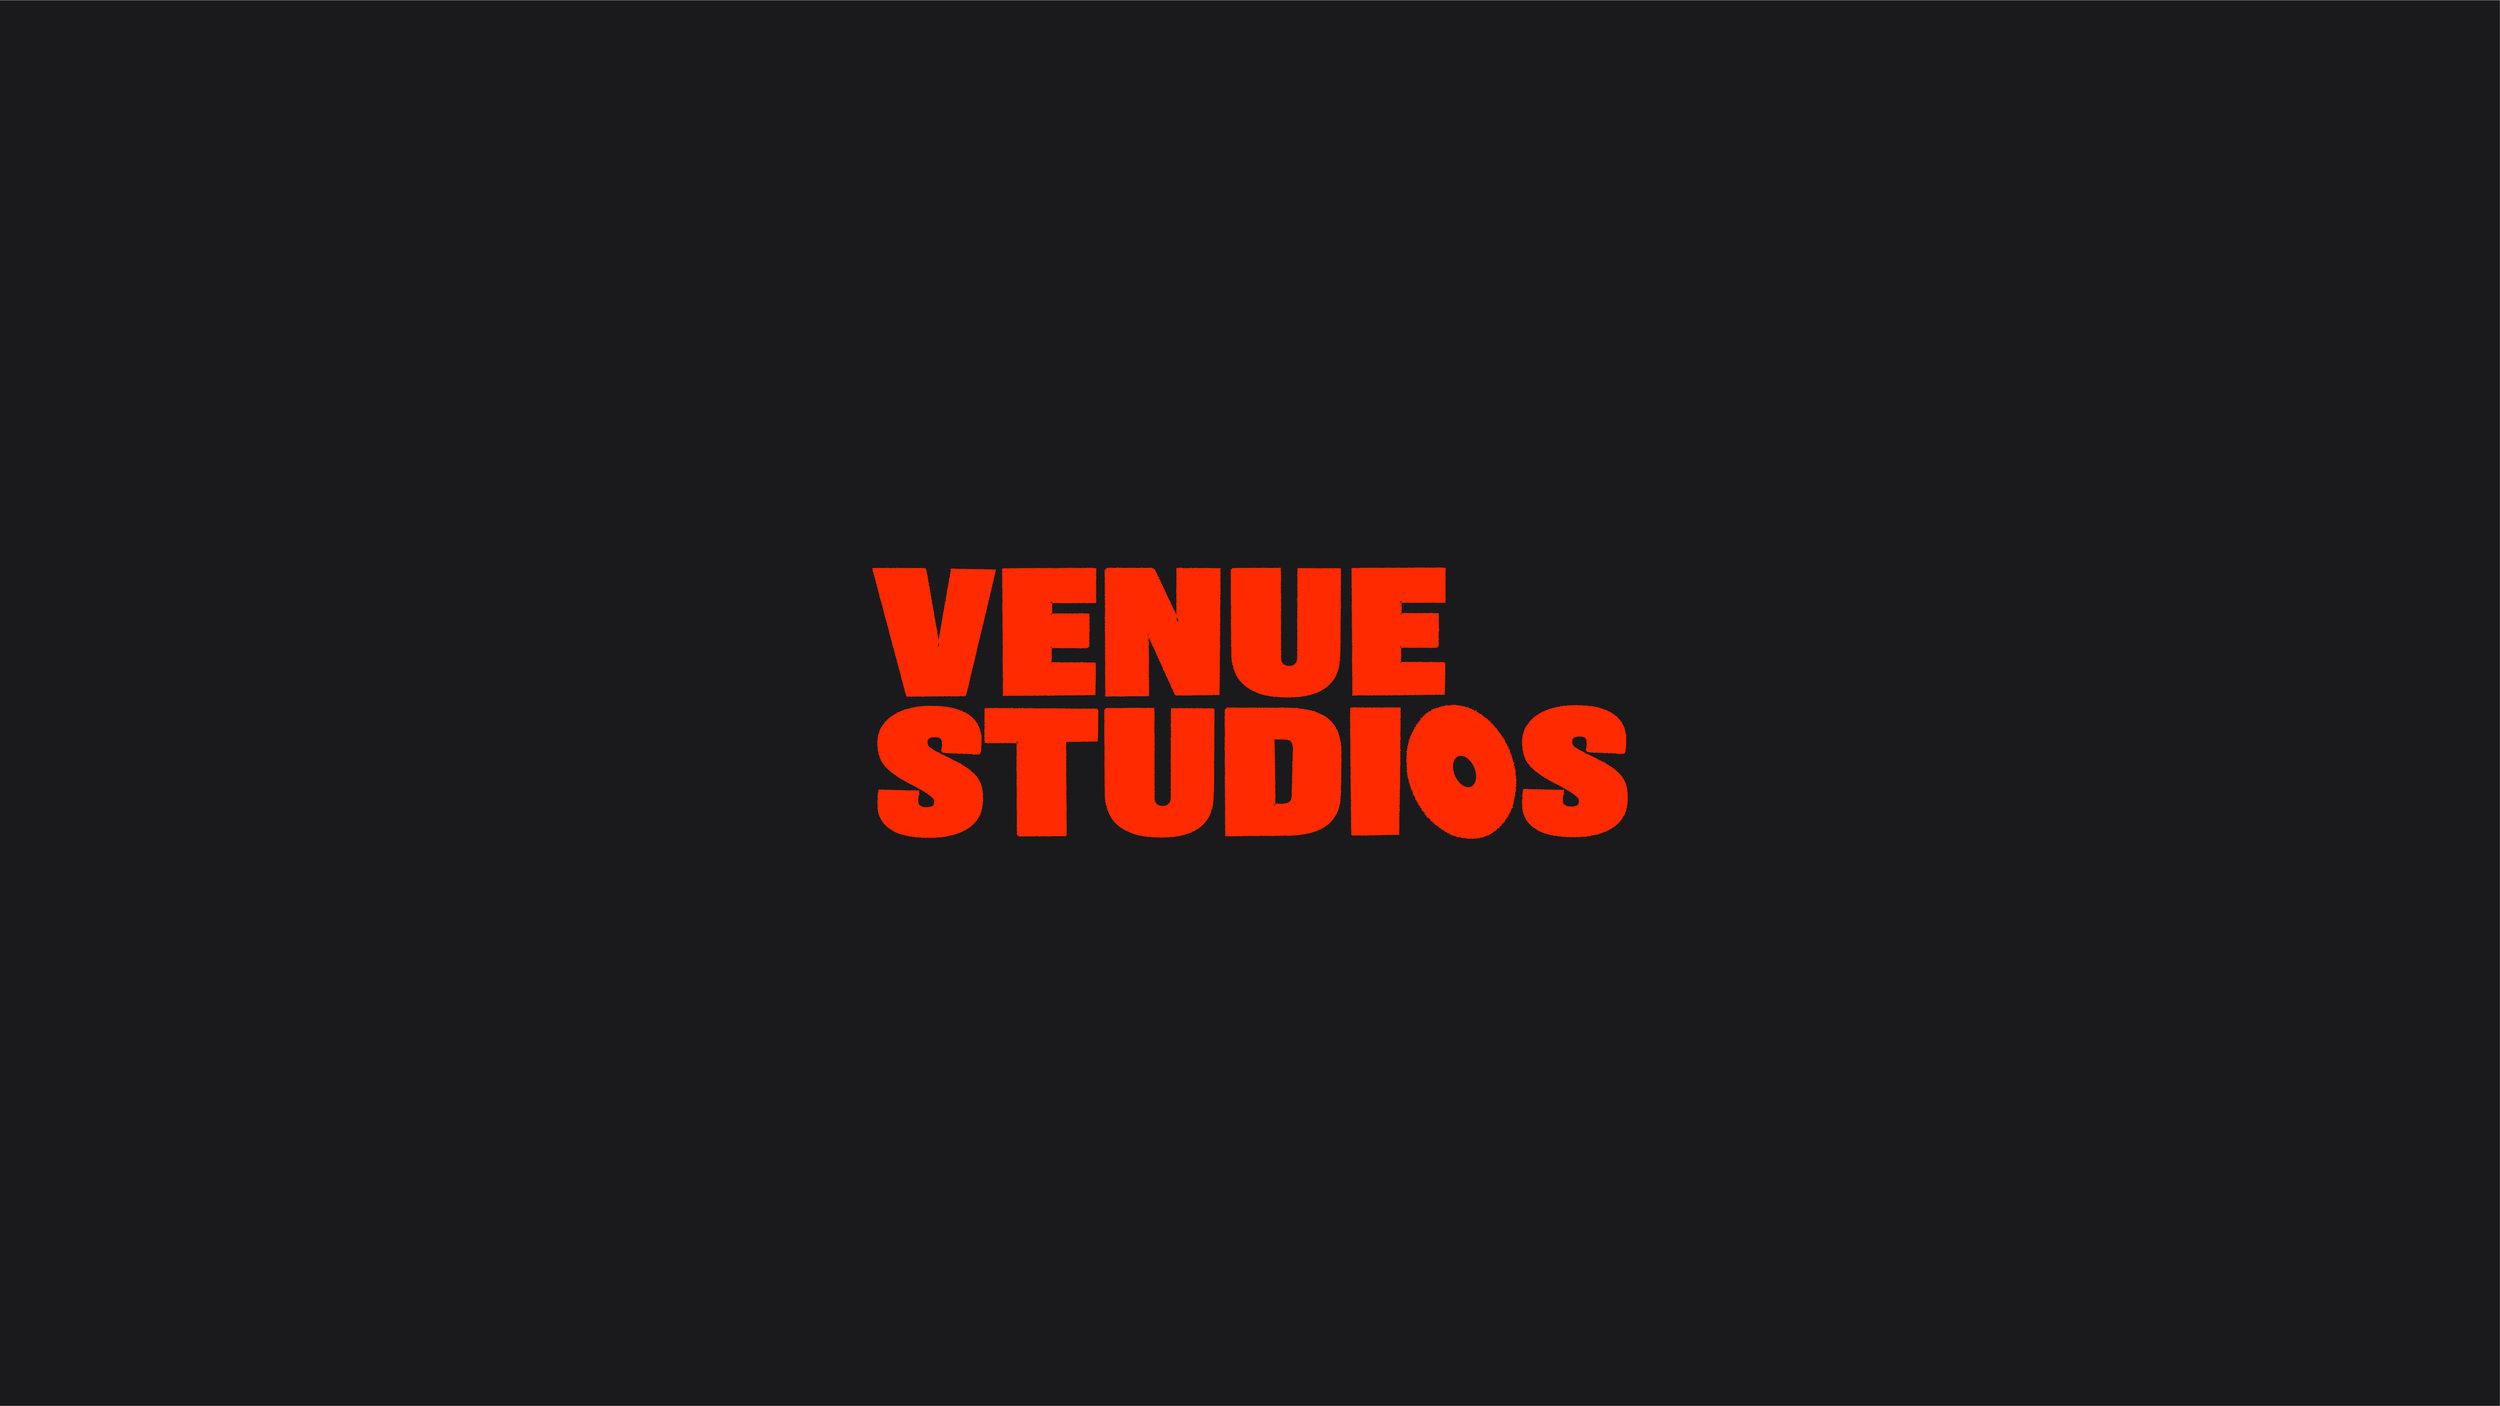 Logo+Files_Venue+Studios.jpg